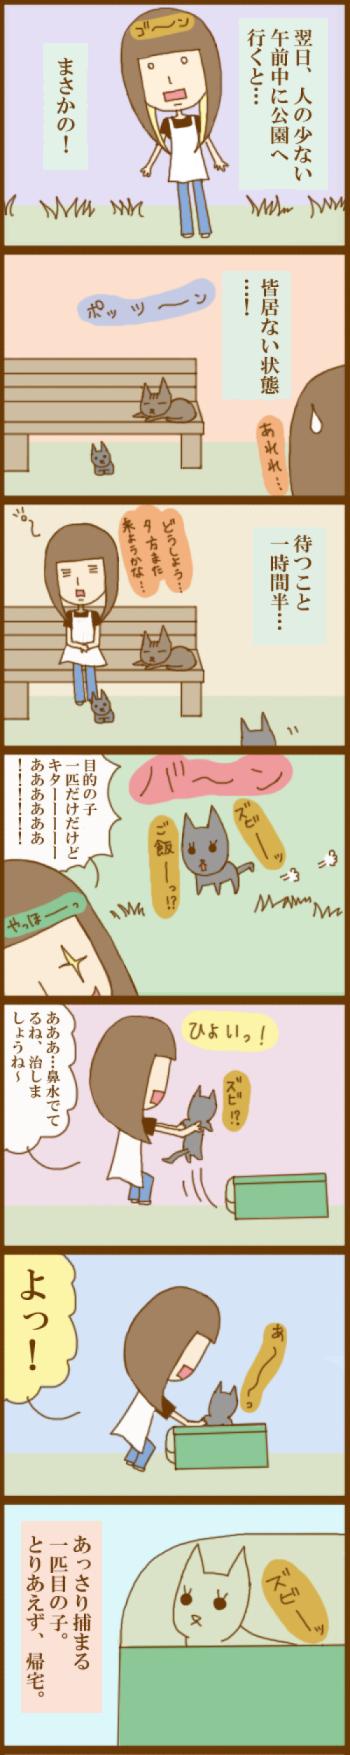 f:id:suzuokayu:20201127094654j:plain